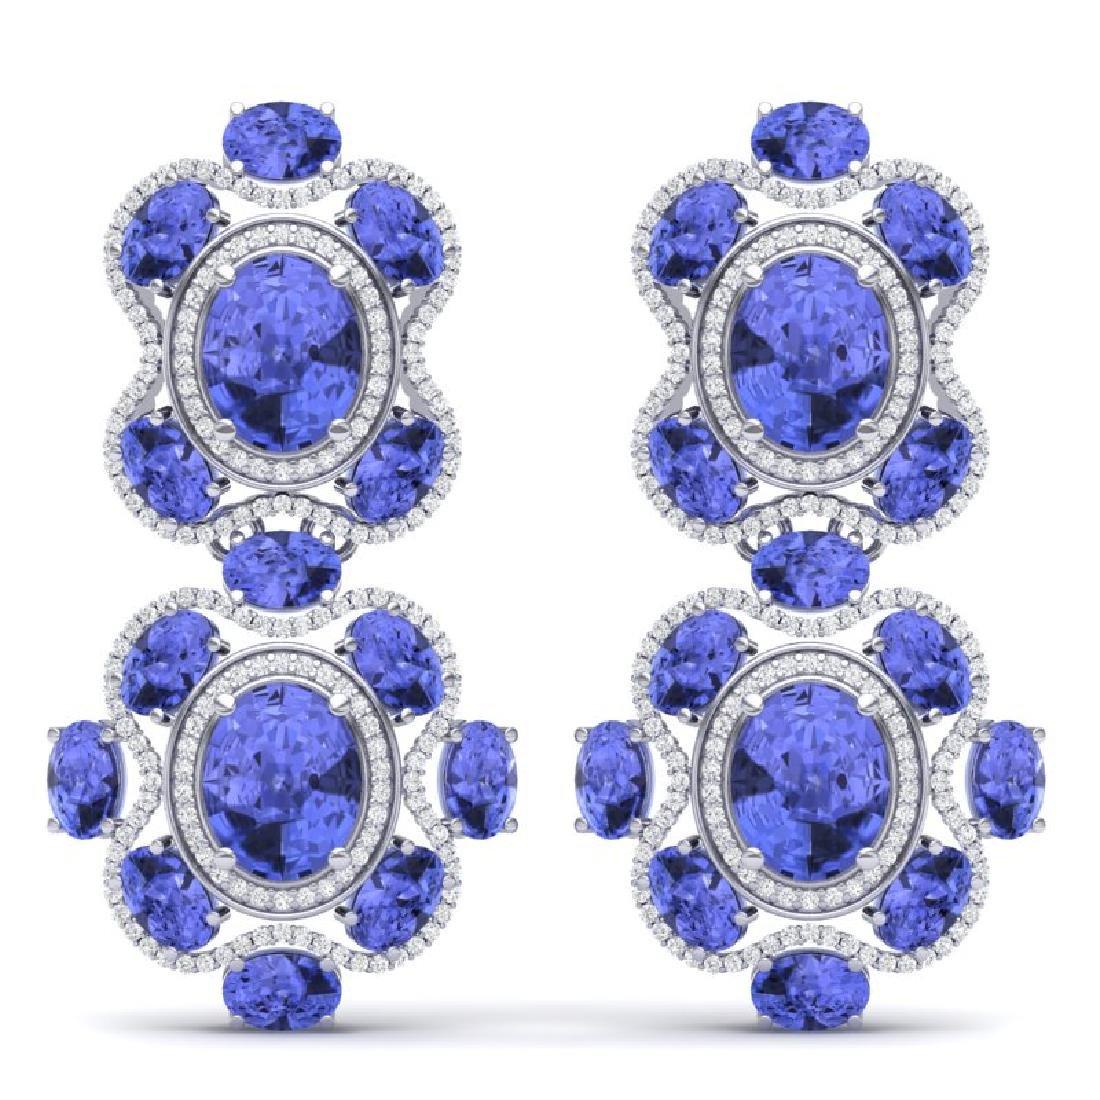 33.11 CTW Royalty Tanzanite & VS Diamond Earrings 18K